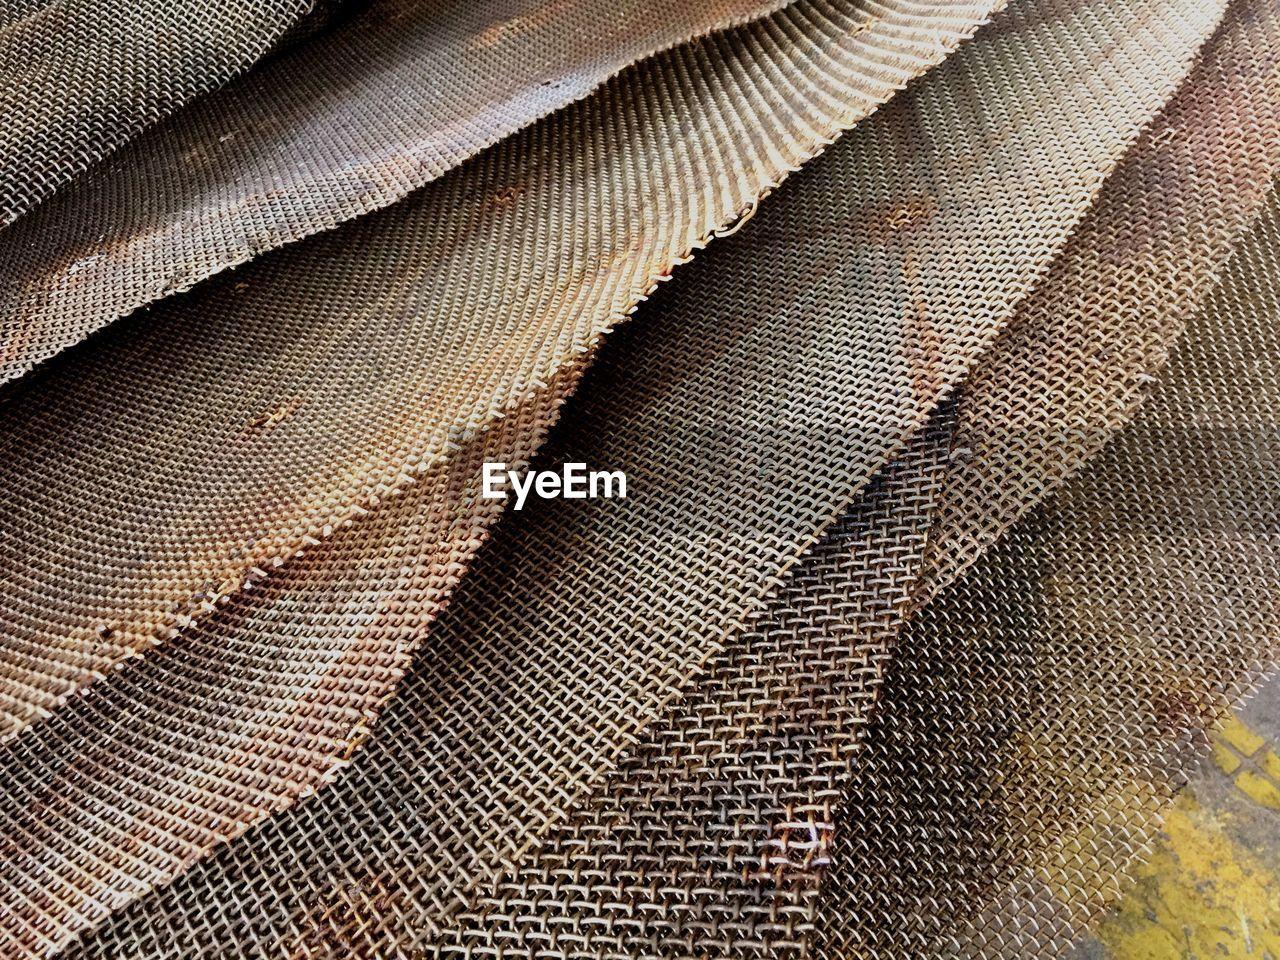 Close-up of metallic sheets